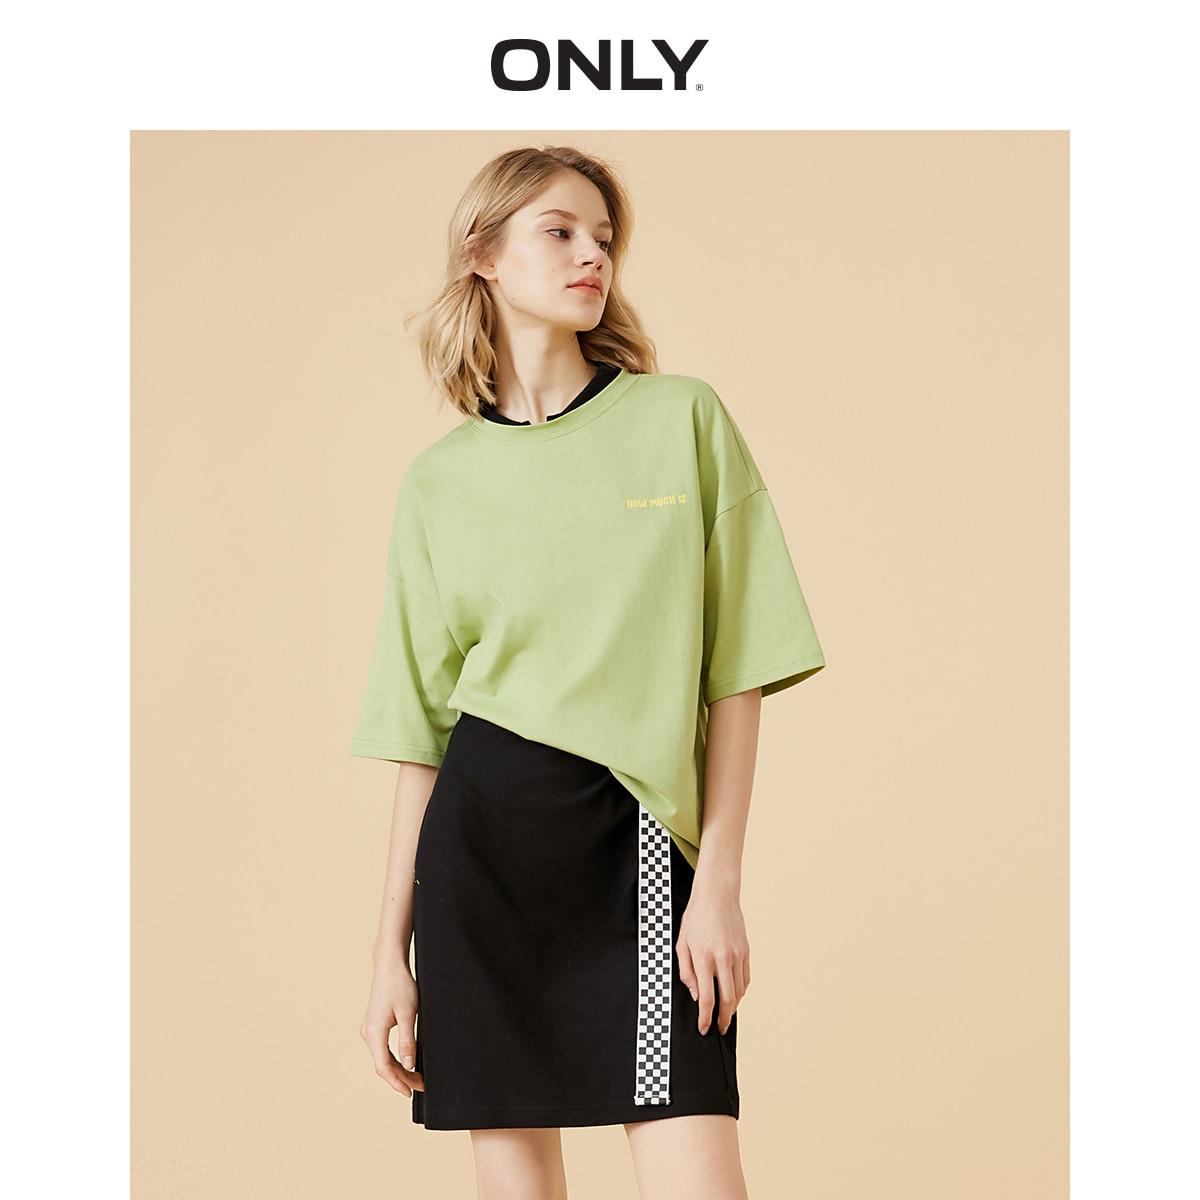 ONLY Women's 100% Cotton Round Neckline Letter Print Short-sleeved T-shirt | 120101633